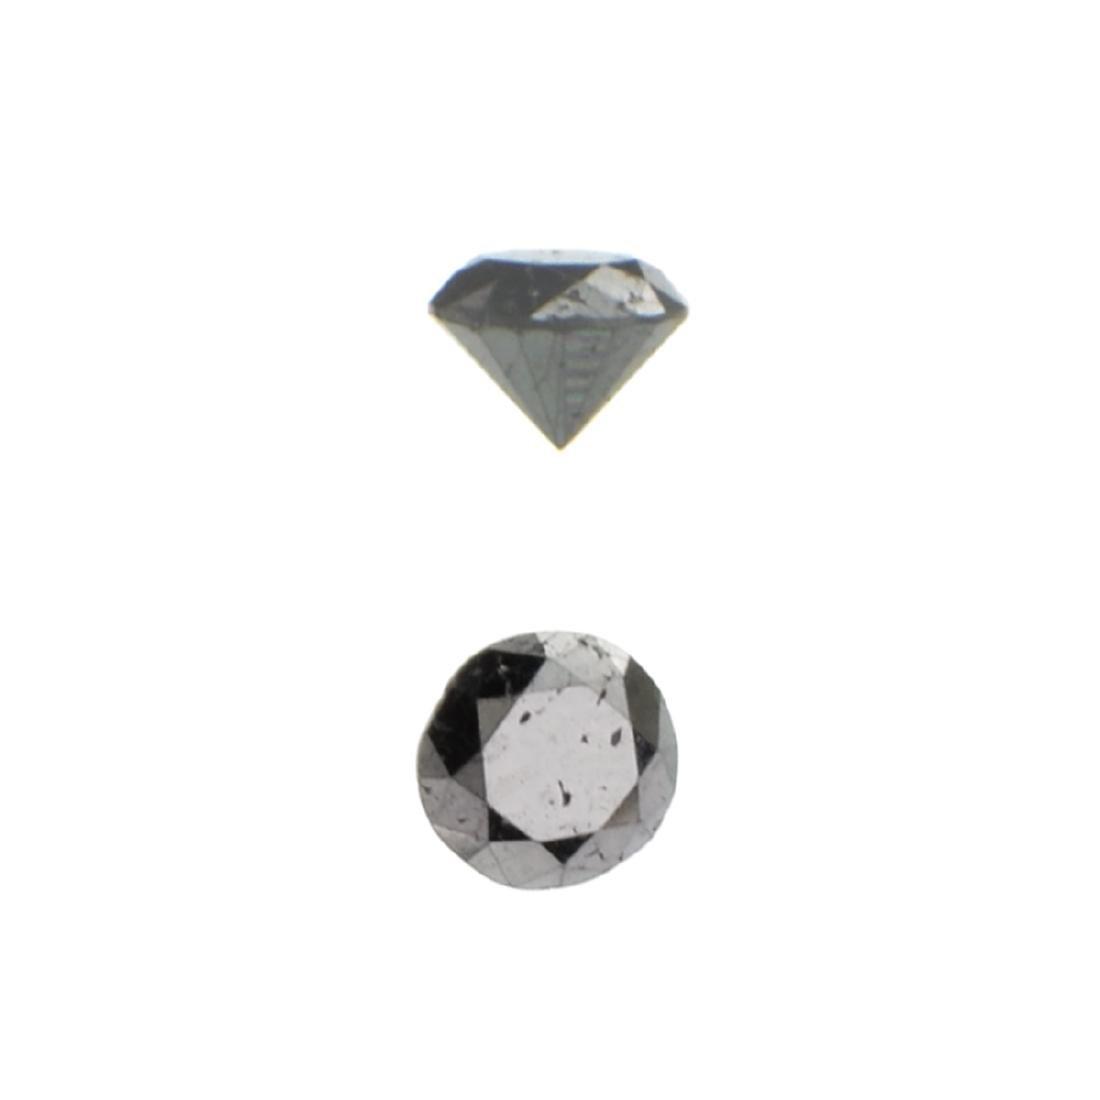 APP: 0.2k 0.31CT Round Cut Black Diamond Gemstone